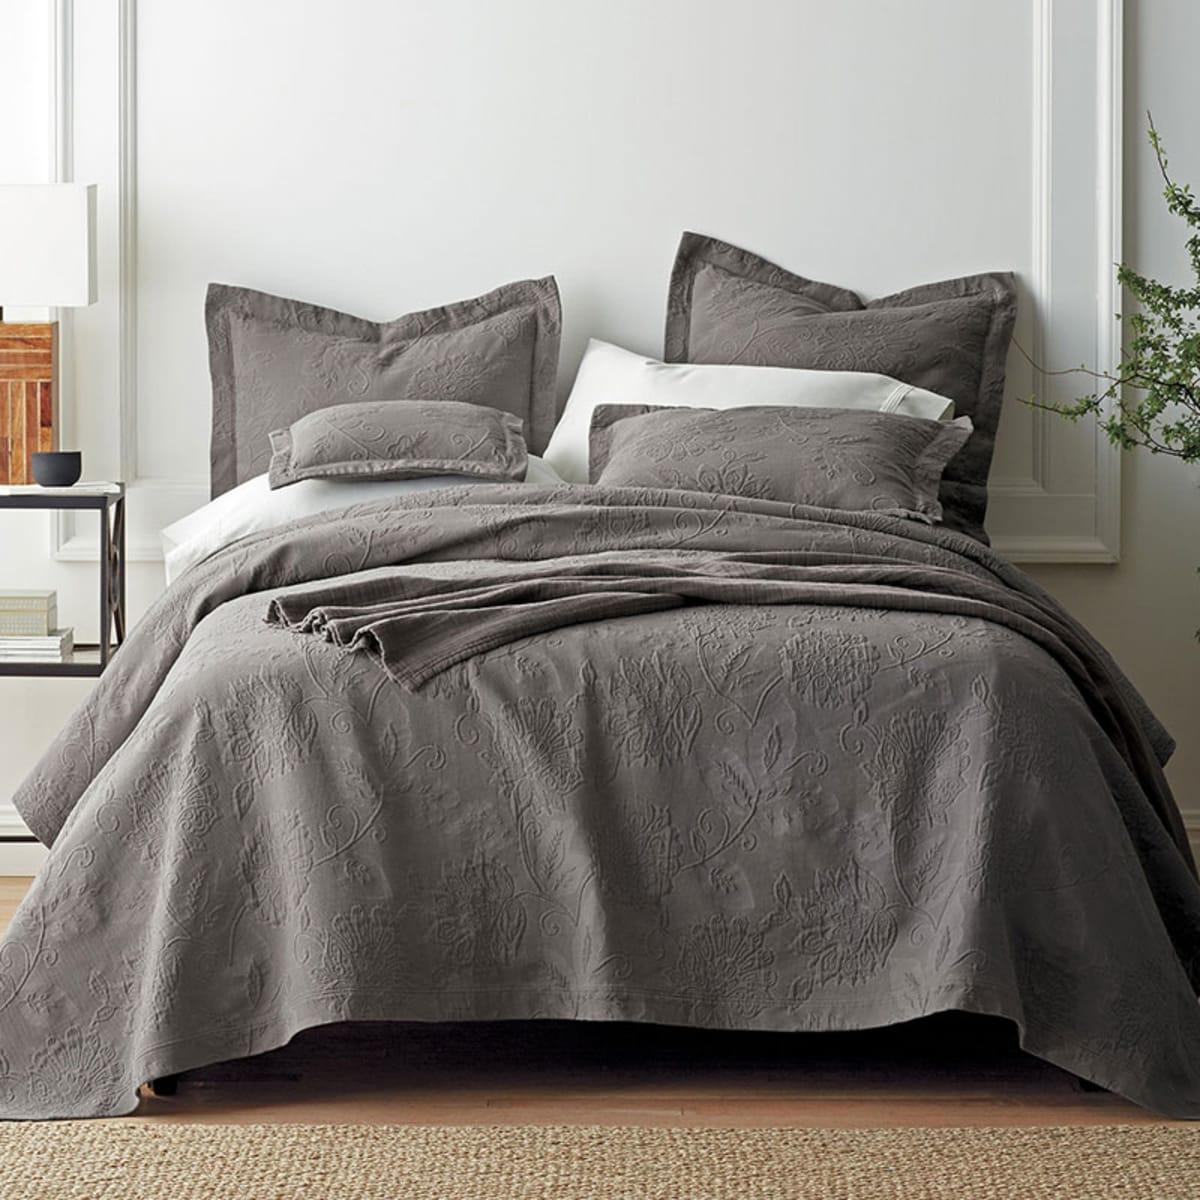 Putnam Cotton Matelasse Bedspread